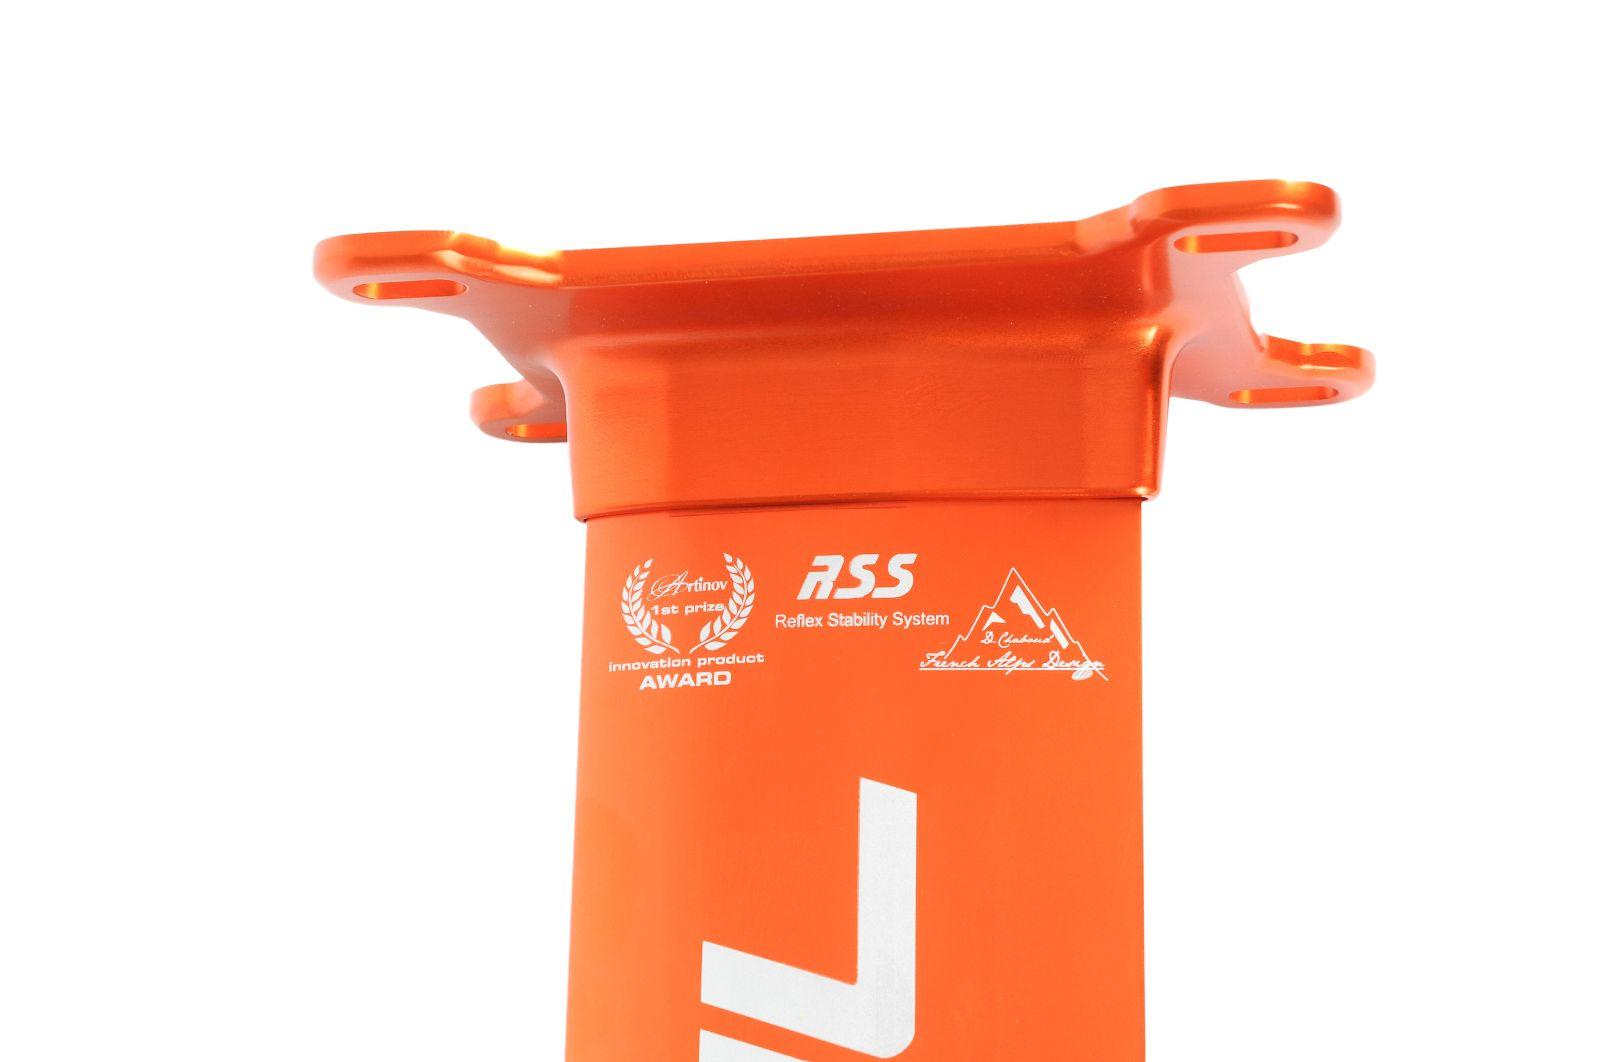 Kitefoil box kfbox tuttle probox plate aluminium access 5 0 3863 1